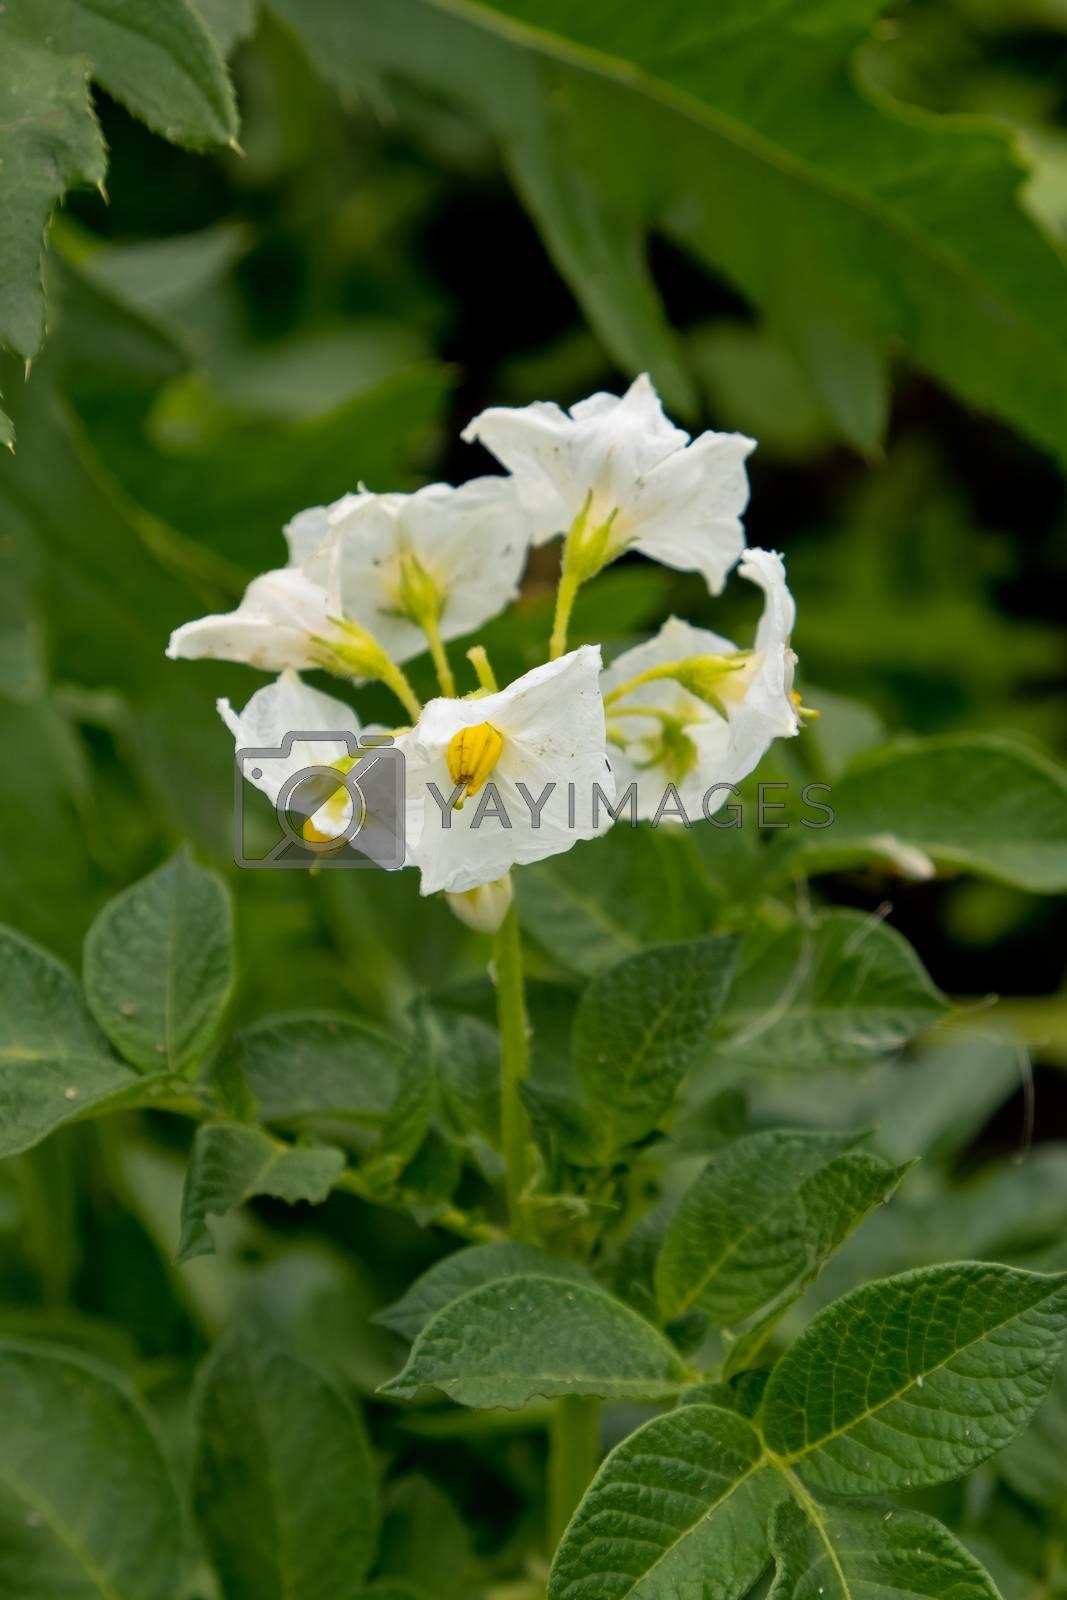 Flowering of growing potatoes. Closeup.